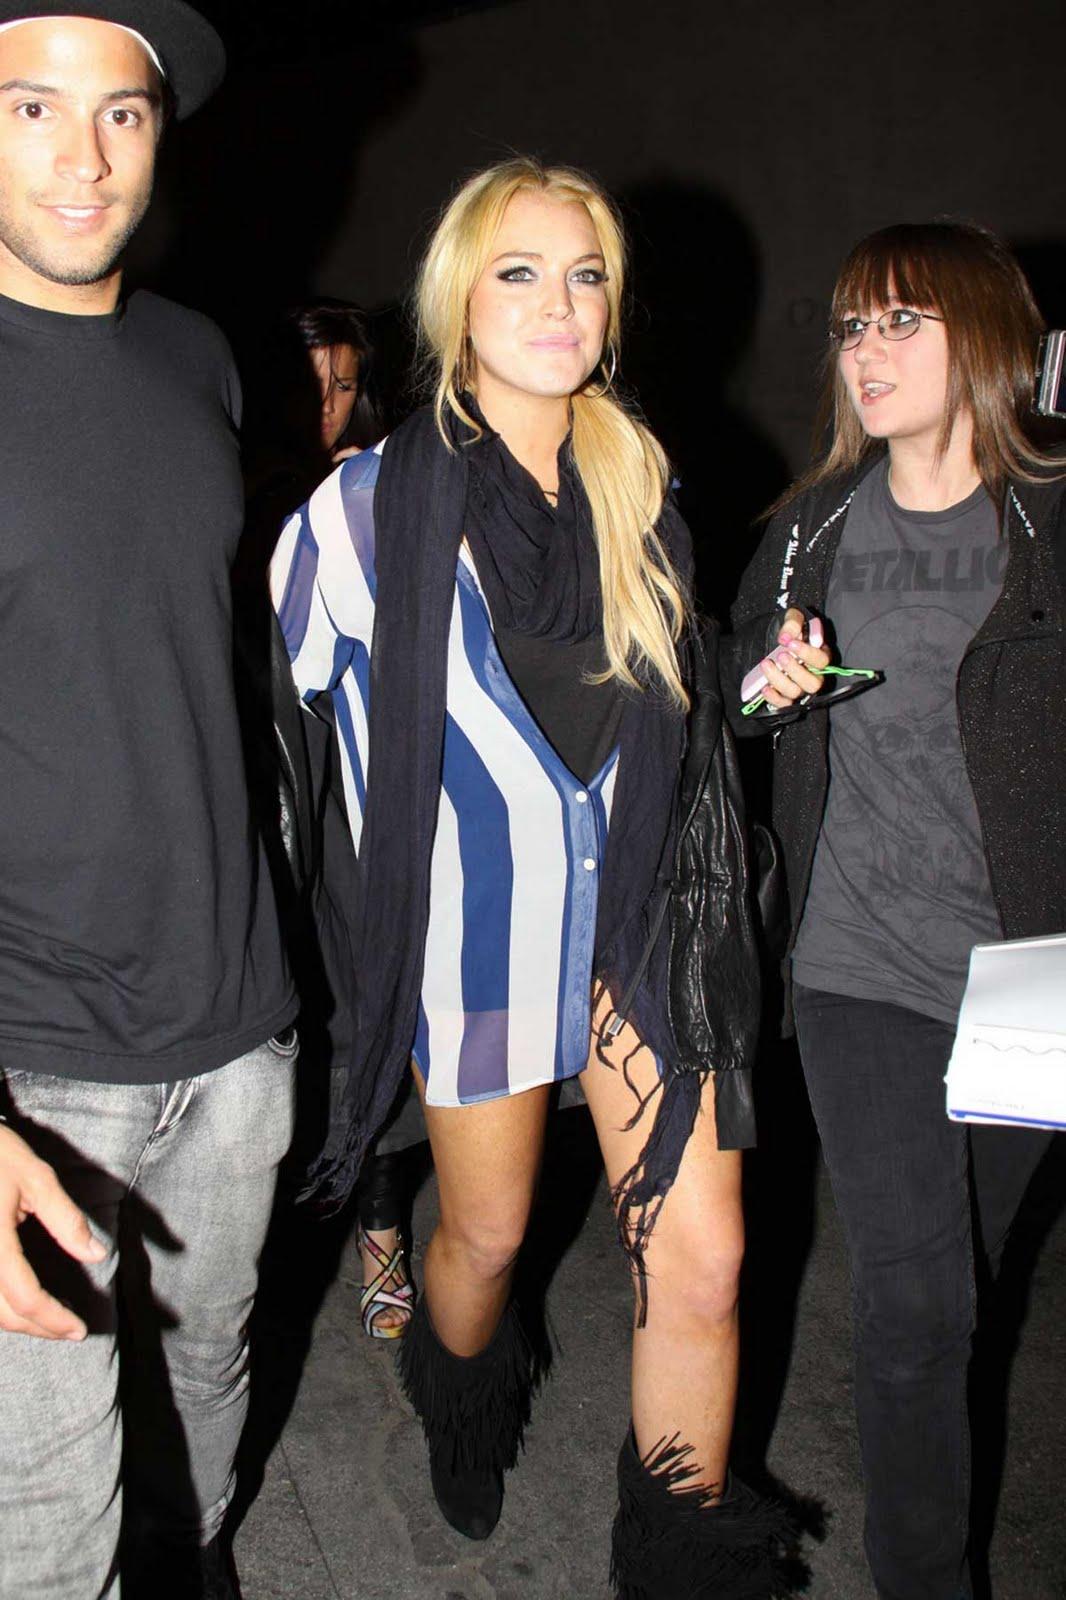 http://1.bp.blogspot.com/_zbsfJpJk1lA/TA6vmgOusJI/AAAAAAAALyw/ZFHTVwBkm3Q/s1600/lindsay_lohan_shorts_3.jpg